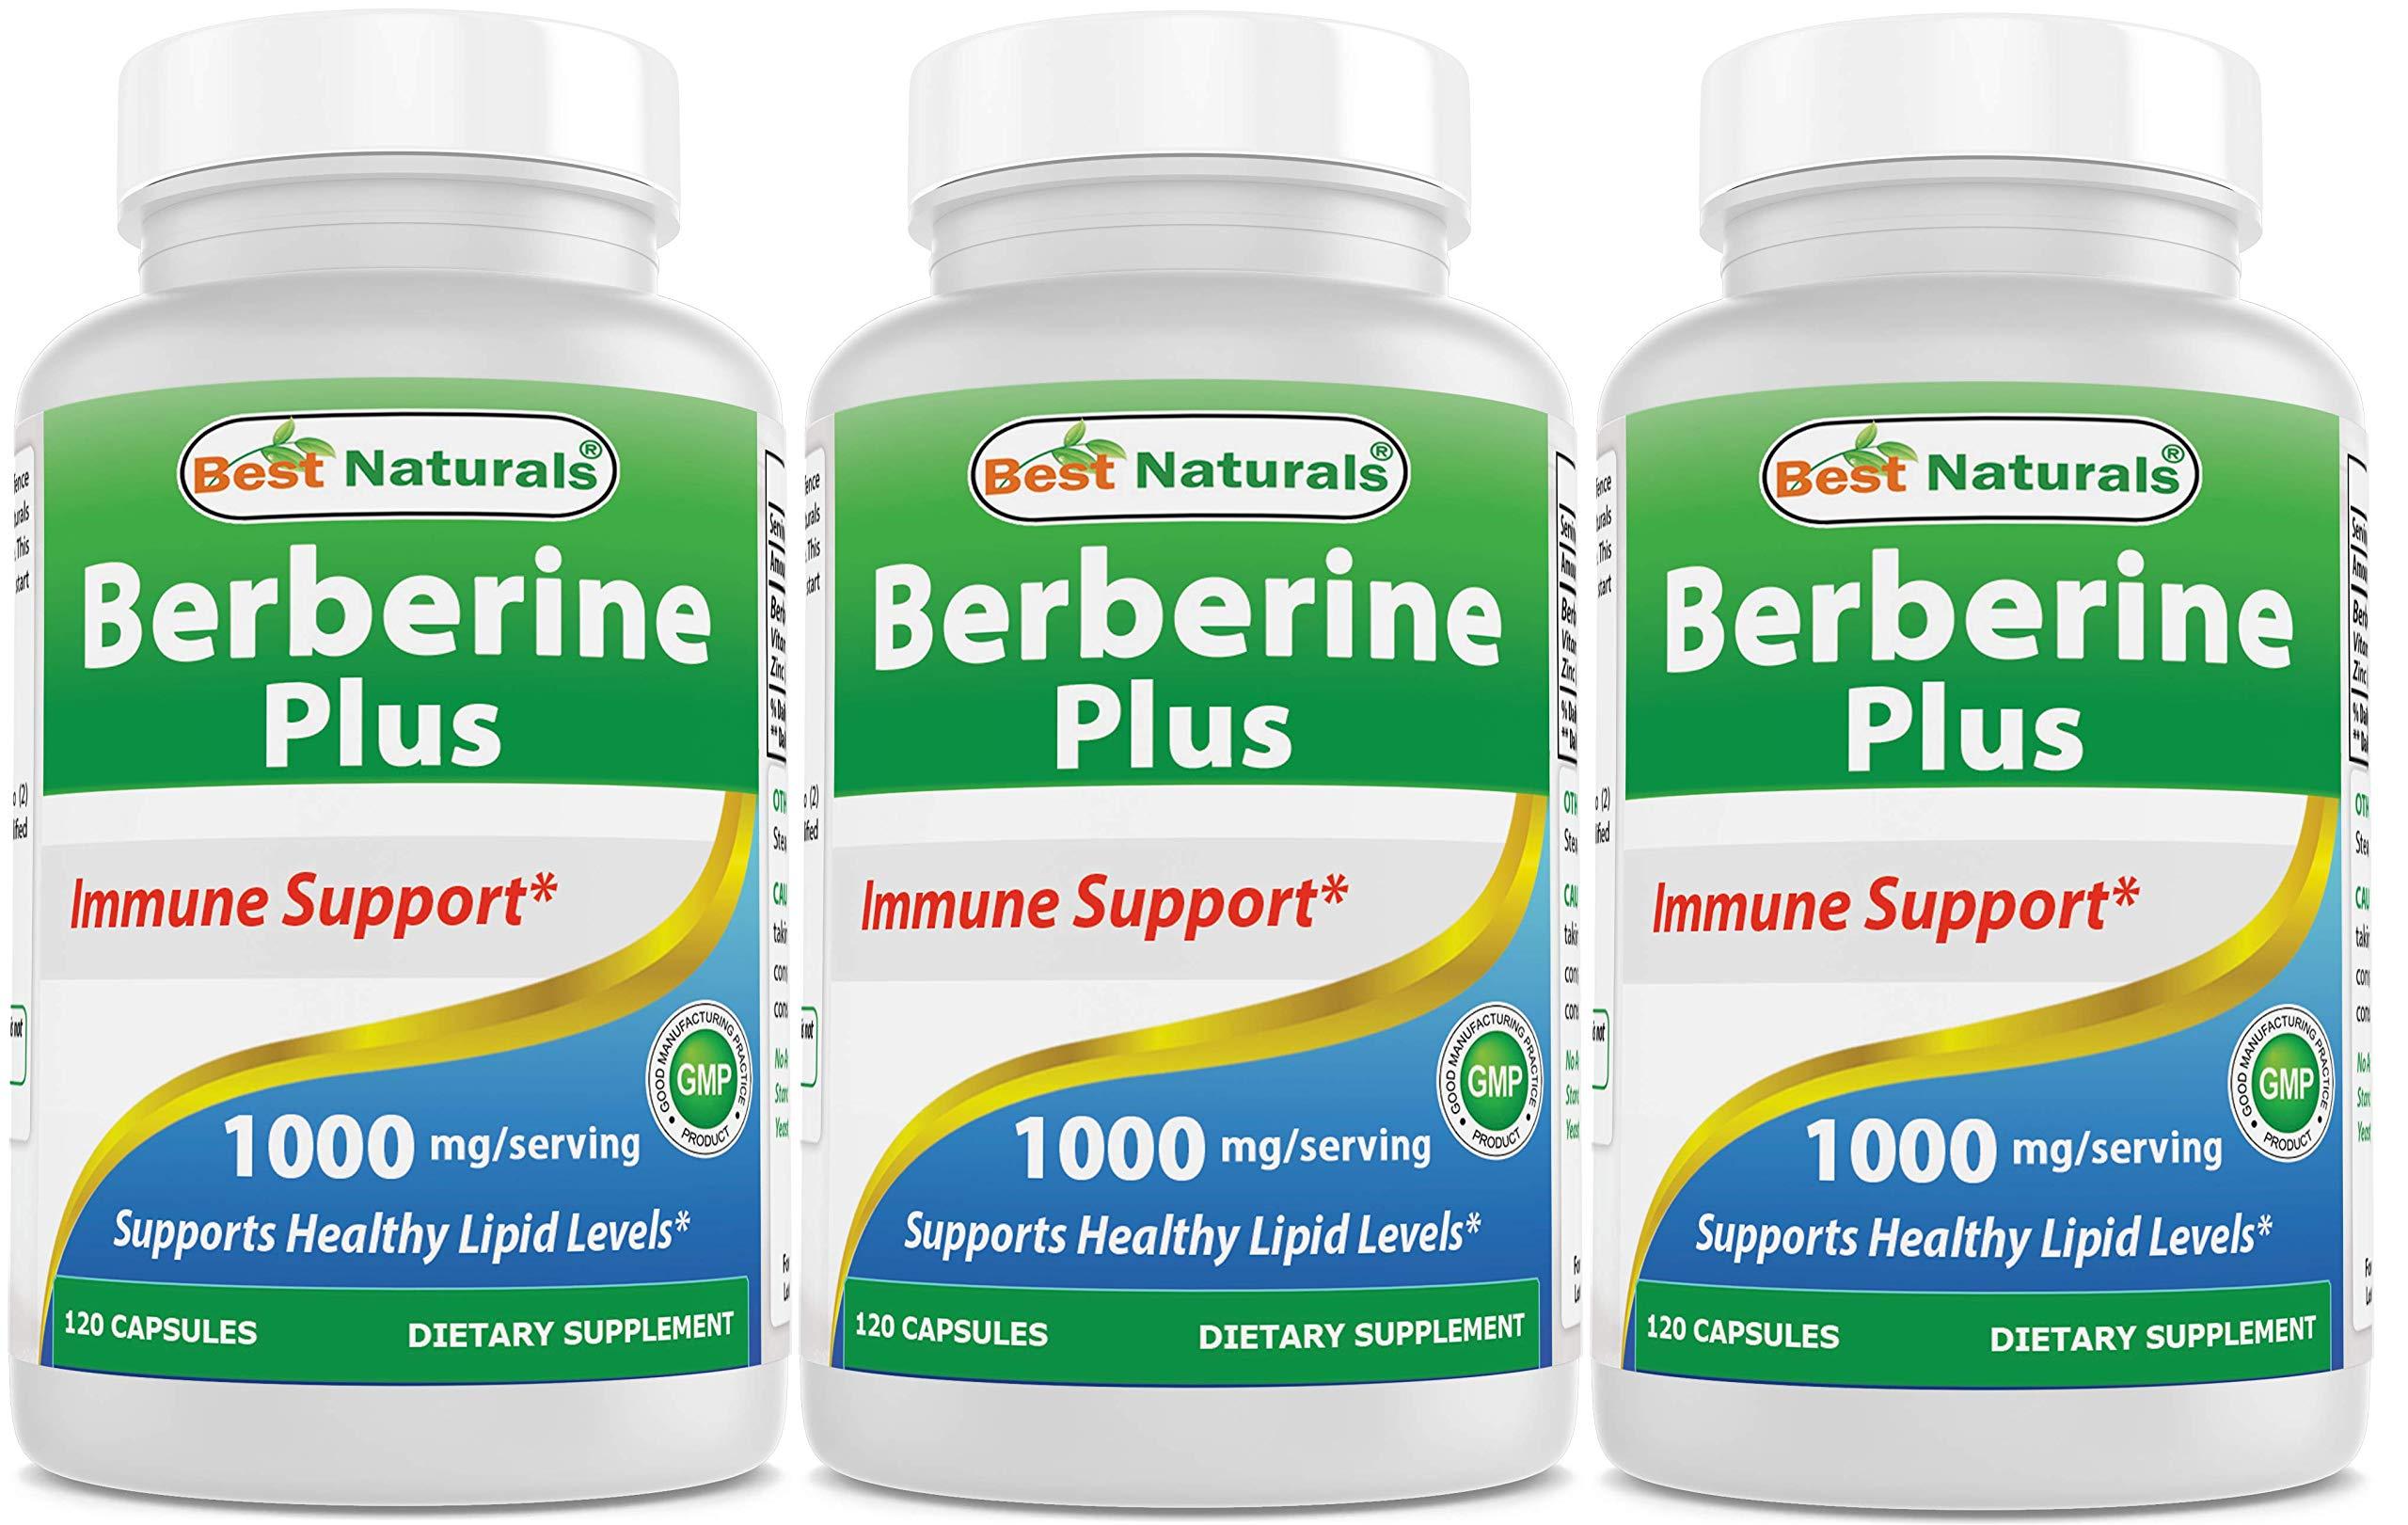 Best Naturals Berberine Plus 1000 mg/Serving 120 Capsules - Berberine for Healthy Blood Sugar (3 Pack)